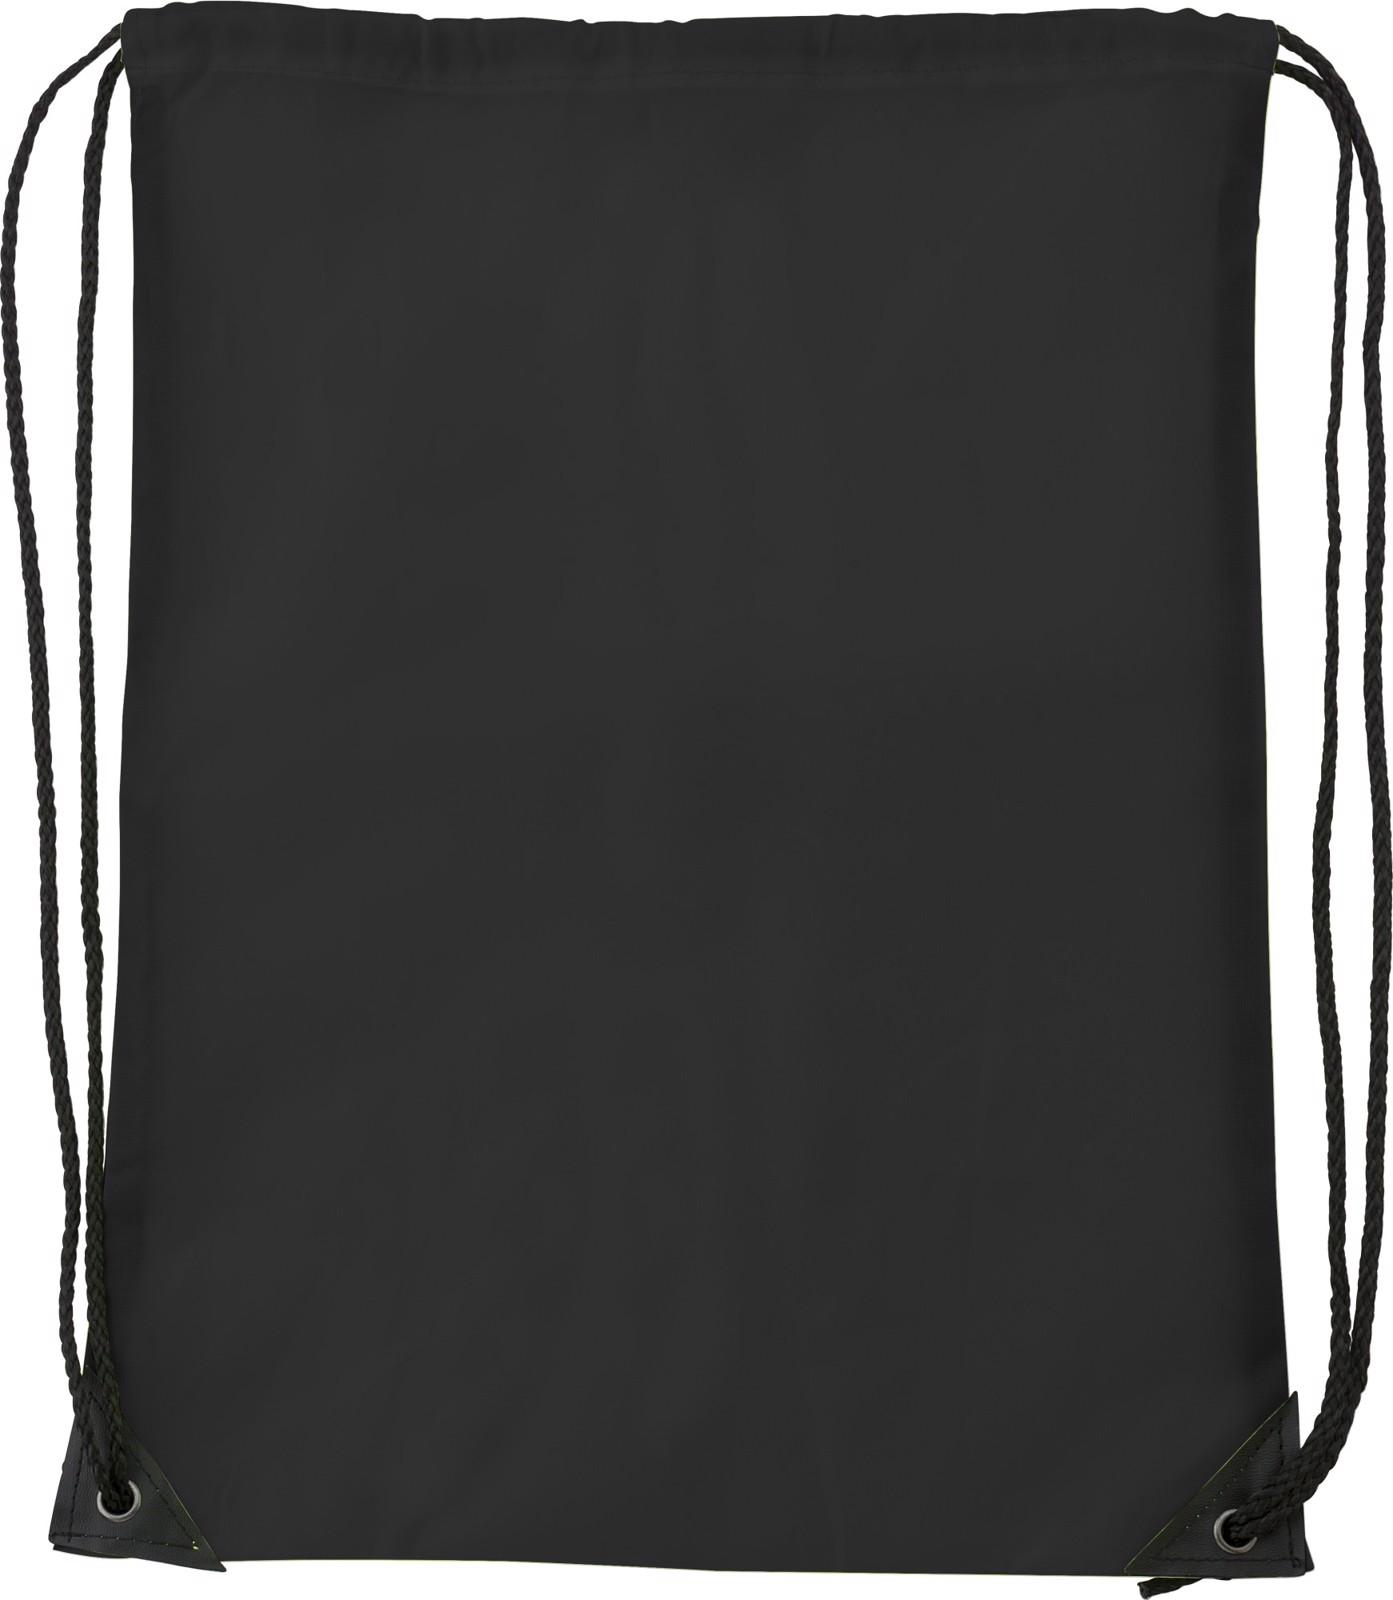 Polyester (210D) drawstring backpack - Black